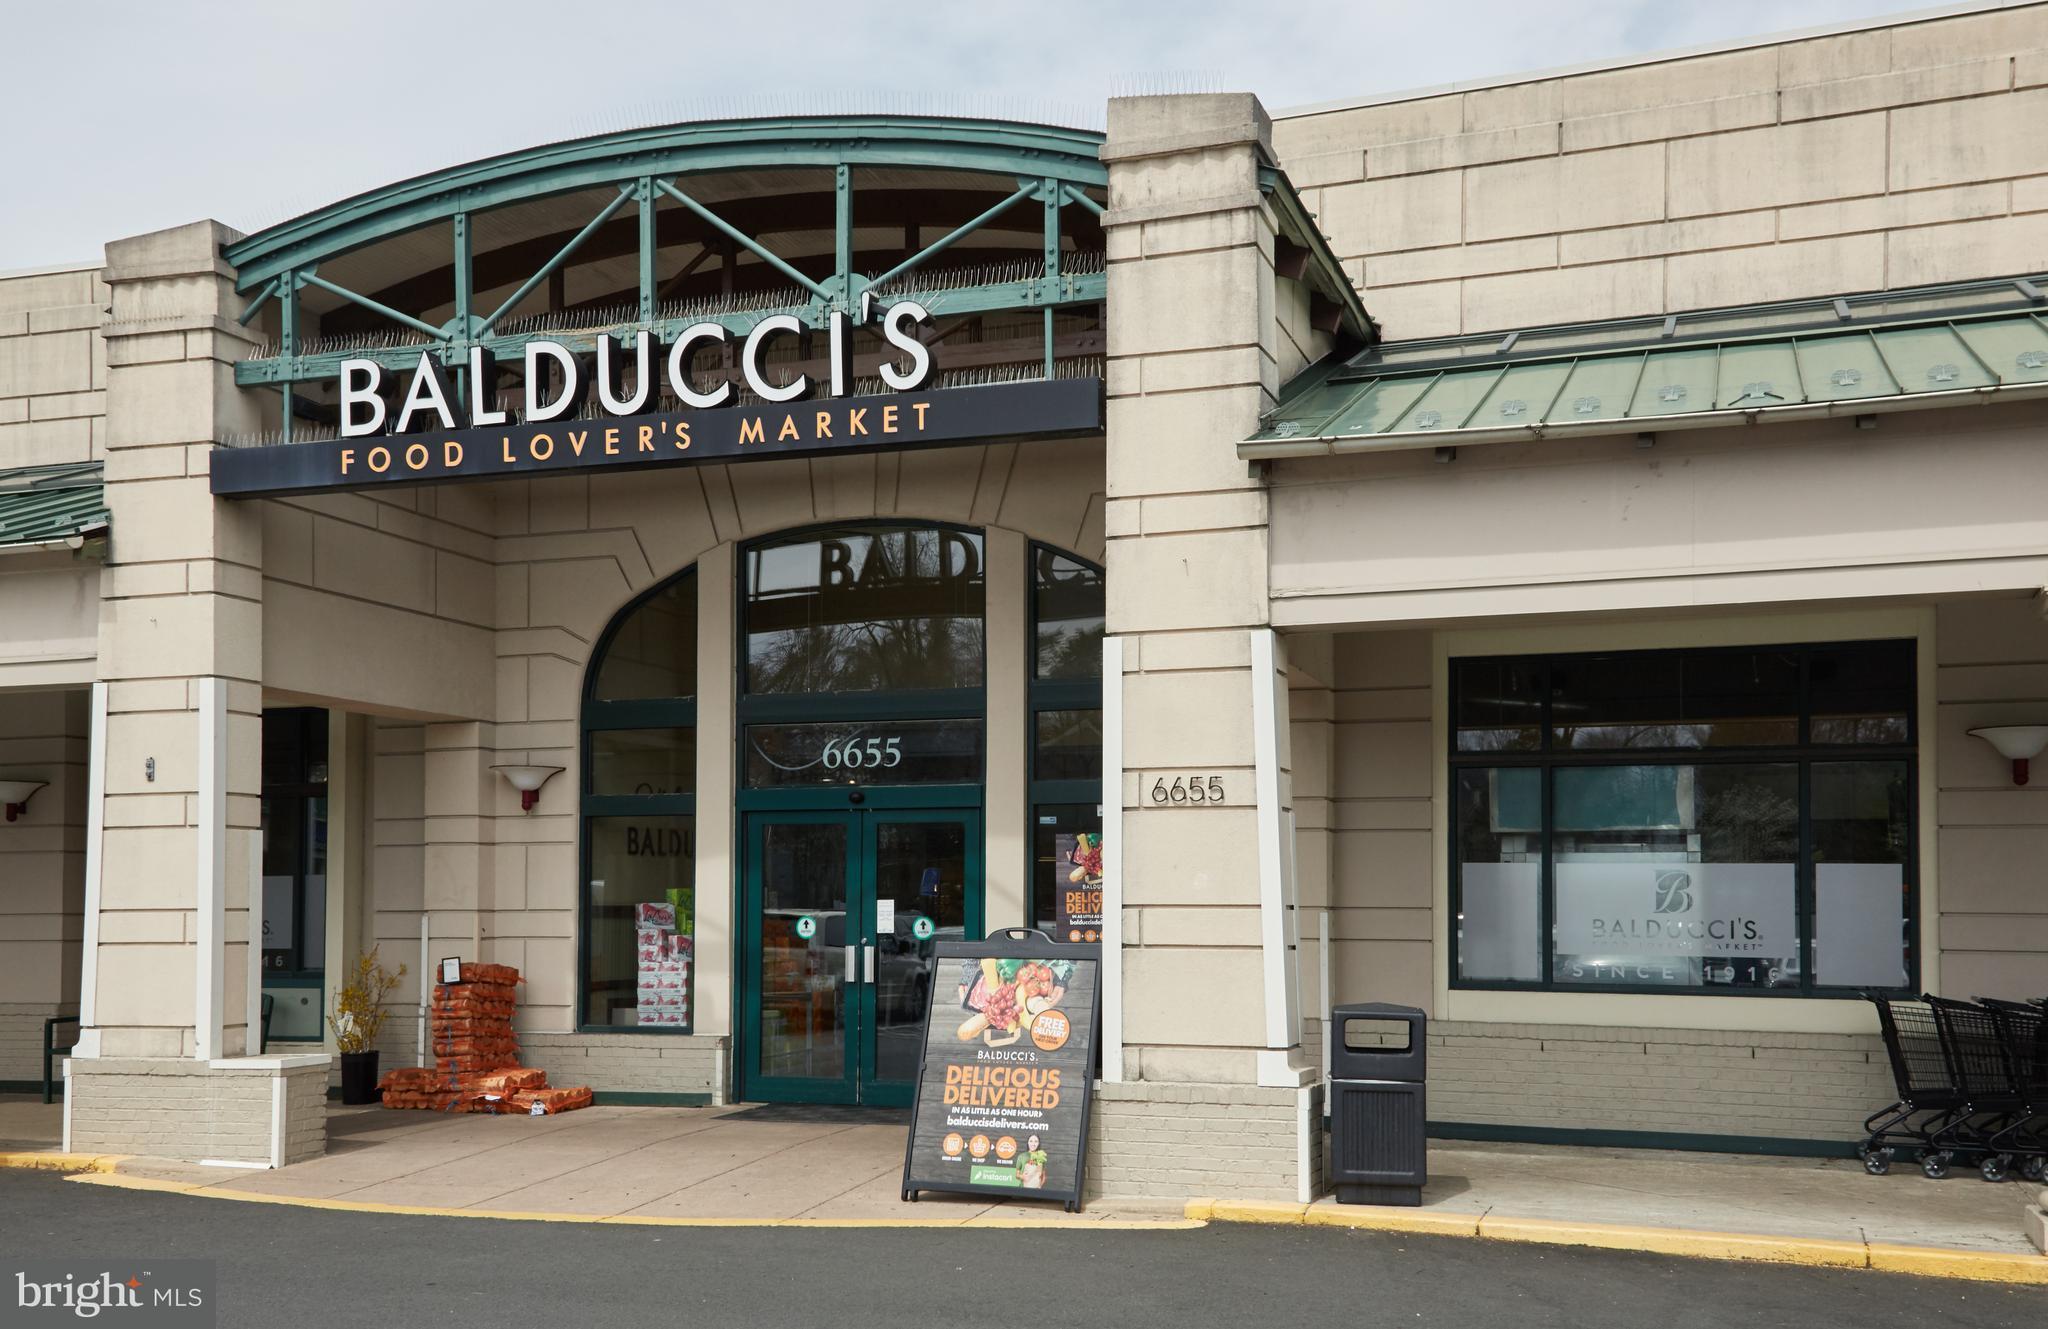 Balduccis storefront